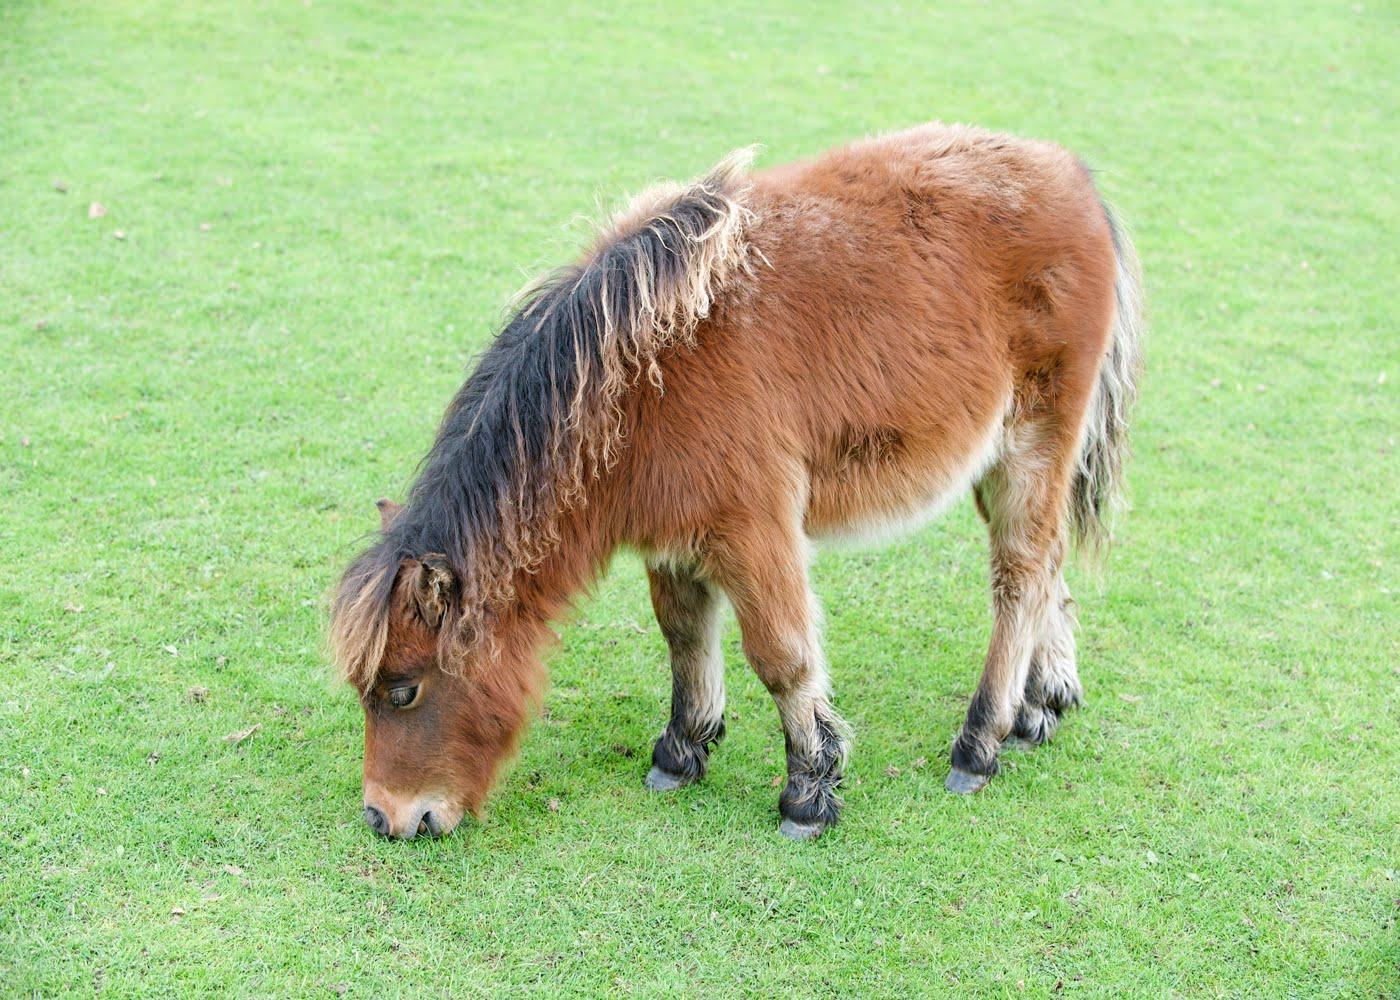 Walaupun Peternakan Kuda Diperkirakan Telah Dimulai Sejak Tahun  Sm Bukti Bukti Penggunaan Kuda Untuk Keperluan M Ia Baru Ditemukan Terjadi Sejak